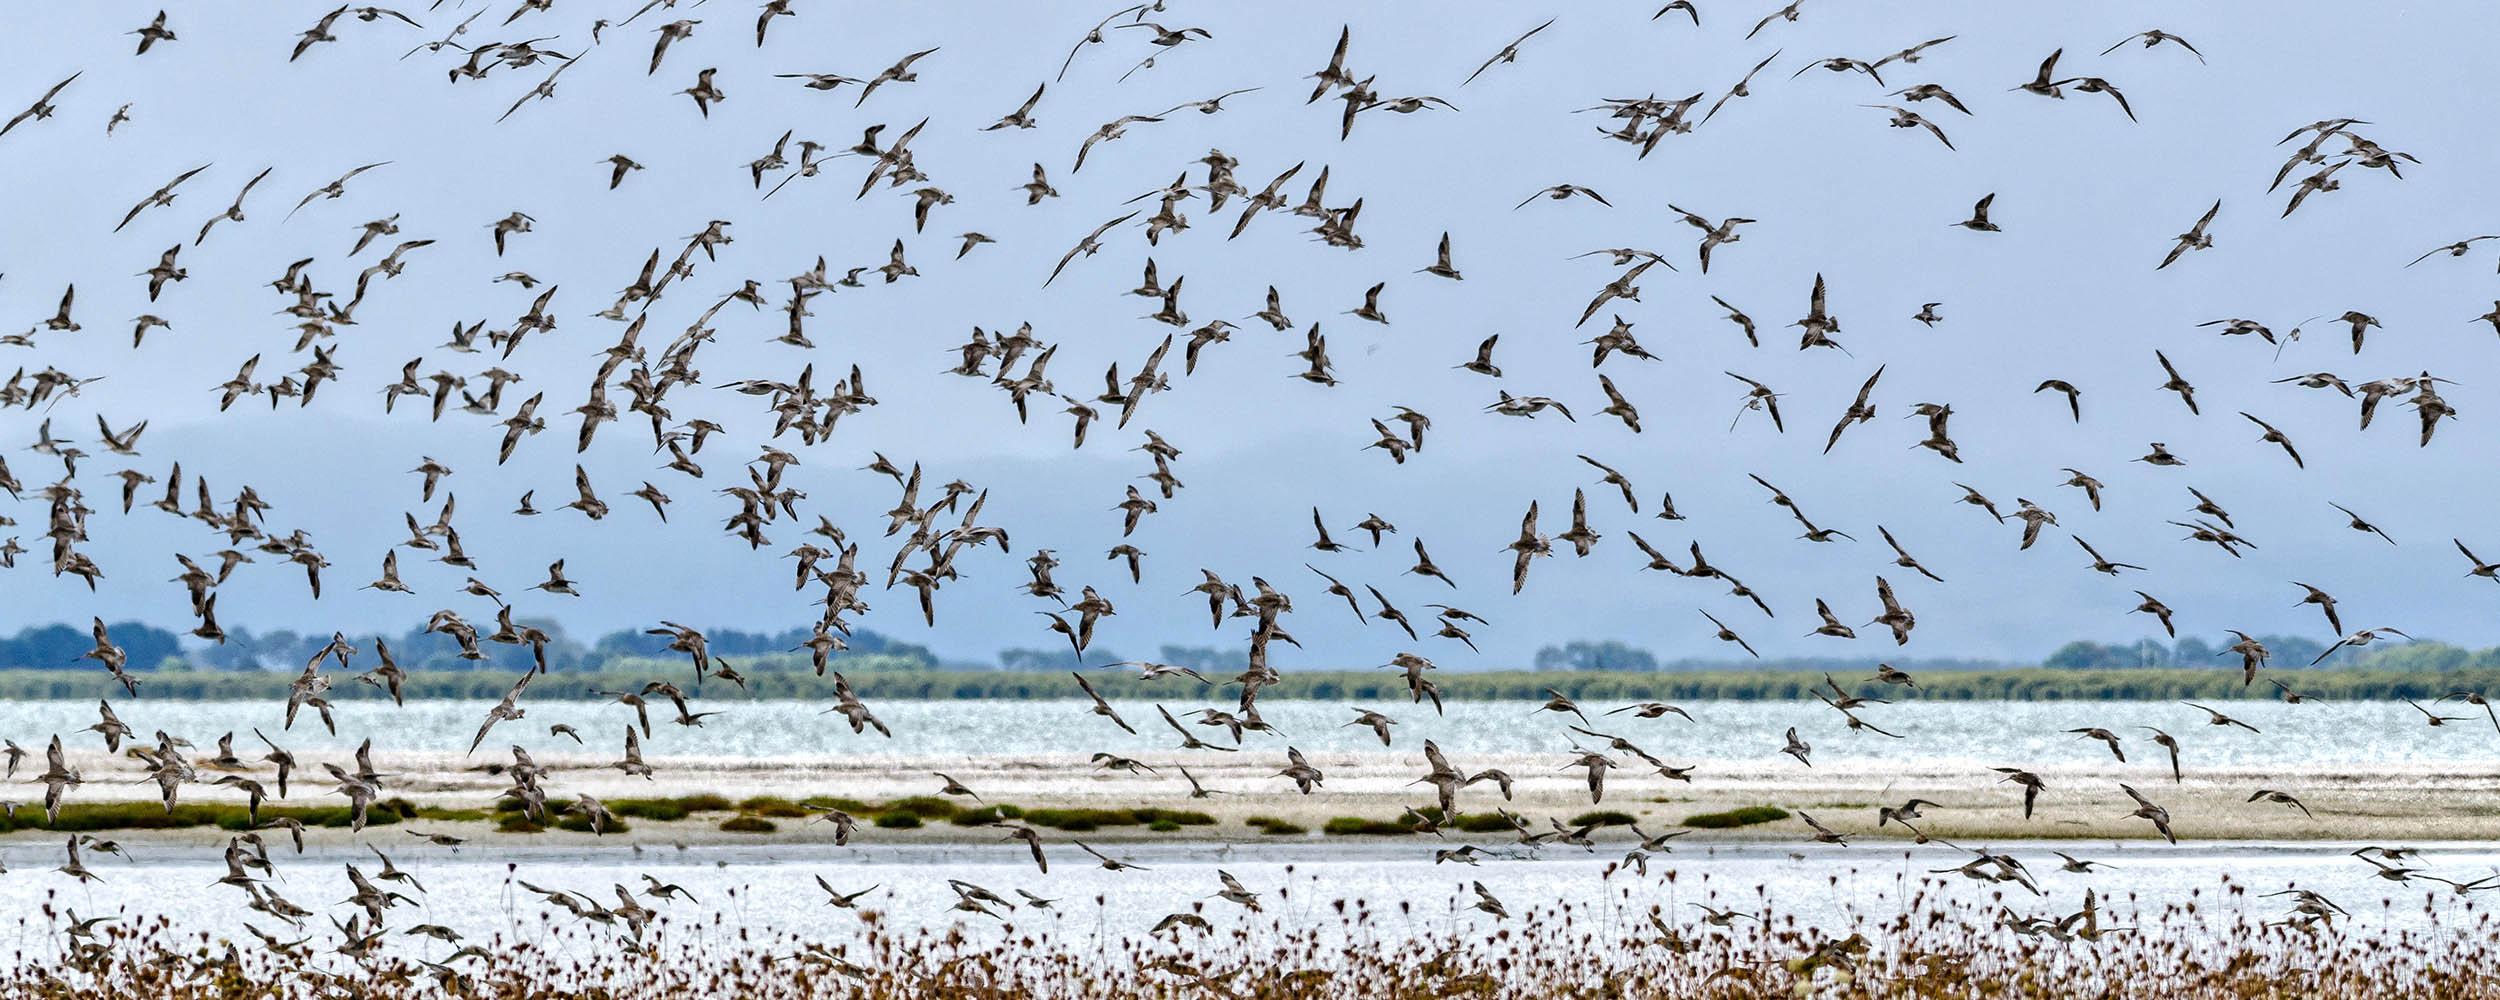 Flock of Flying Birds, Miranda Shore Bird Centre, North Island, New Zealand